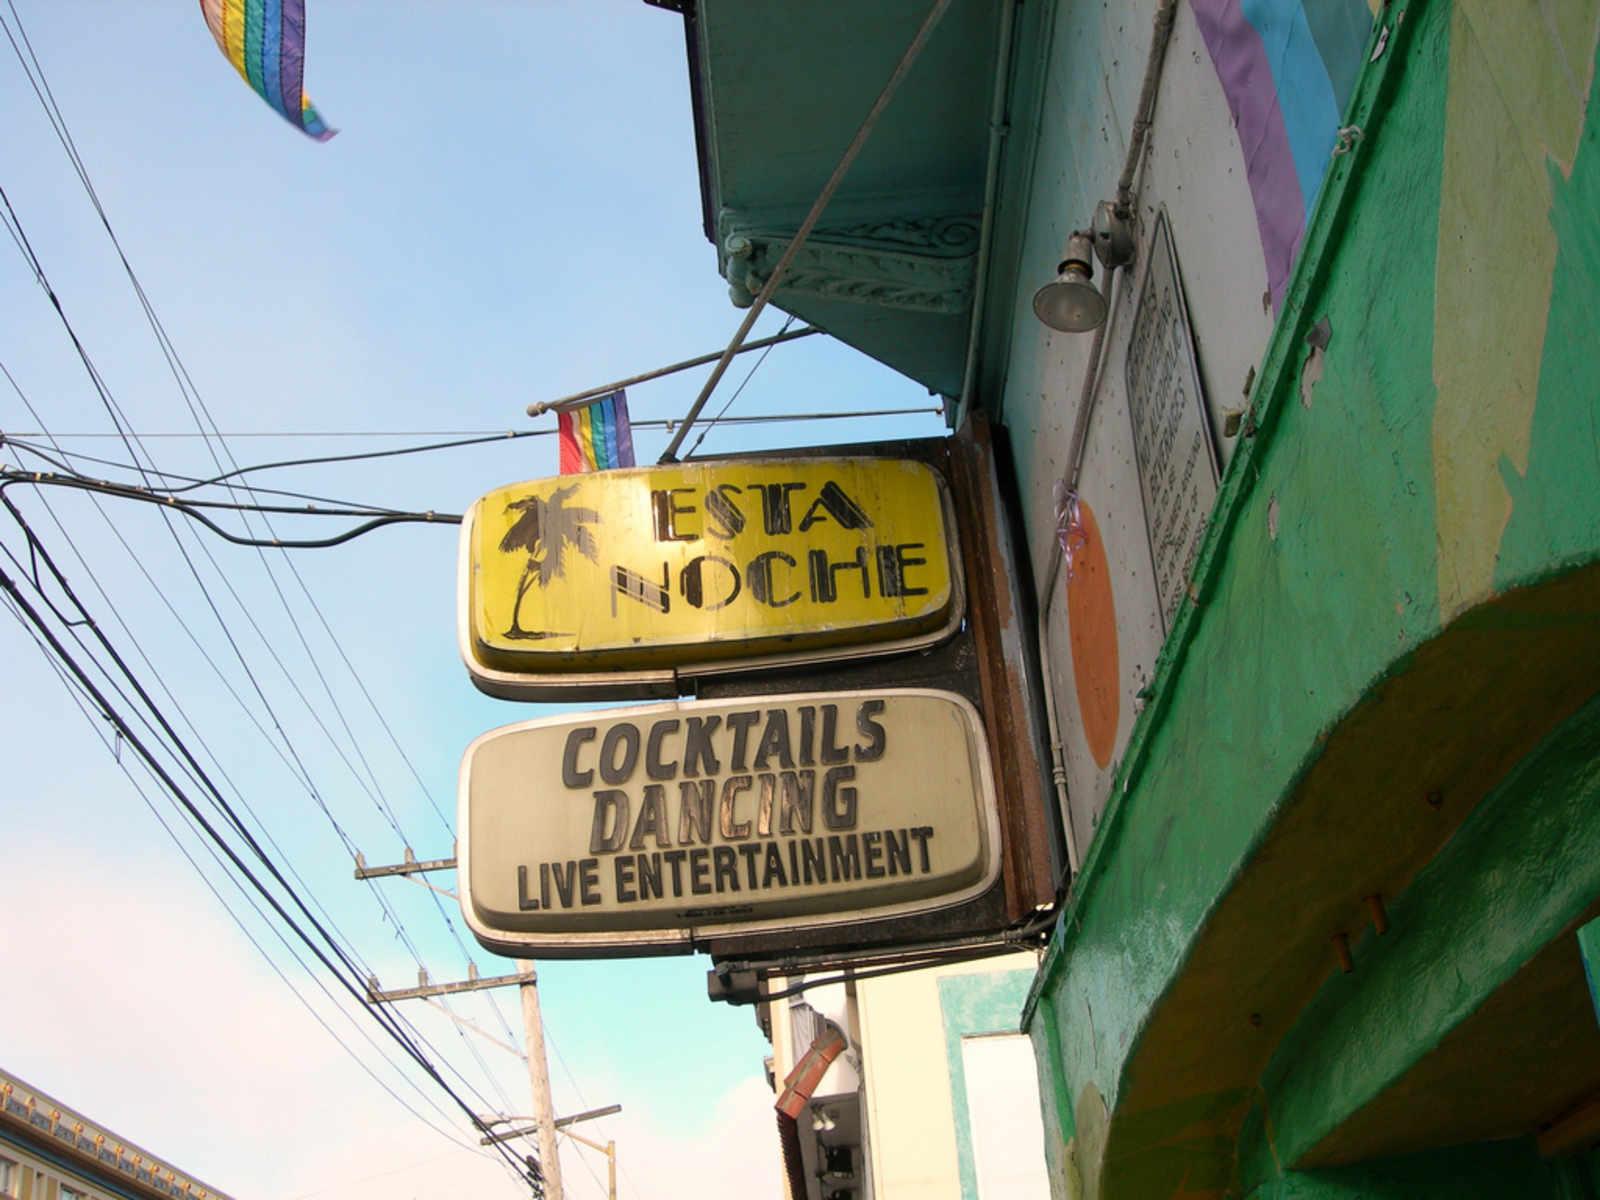 The Esta Noche sign. Photo by Uptown Almanac